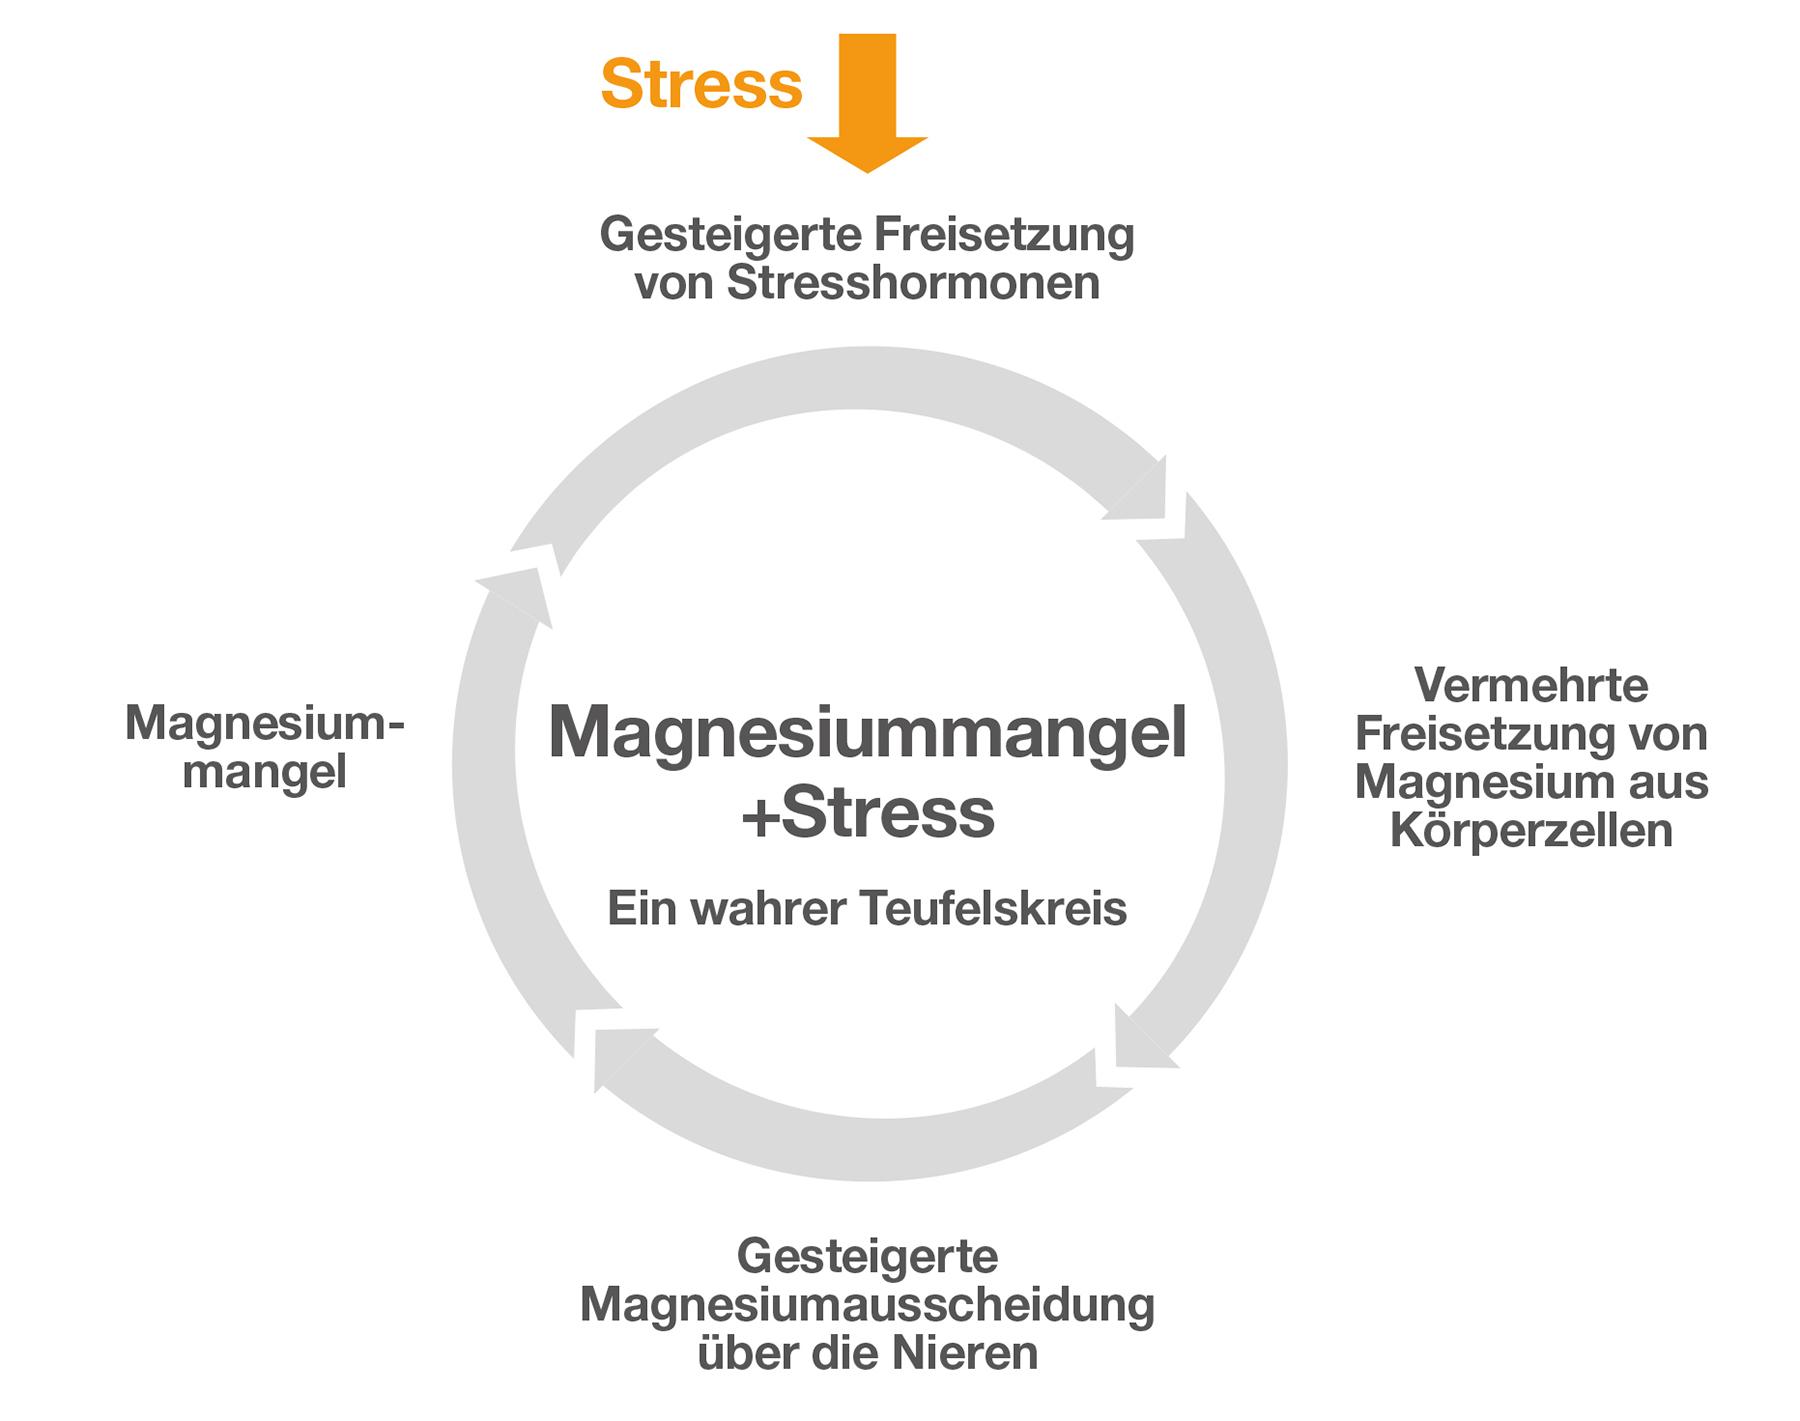 Magnesium bei Stress